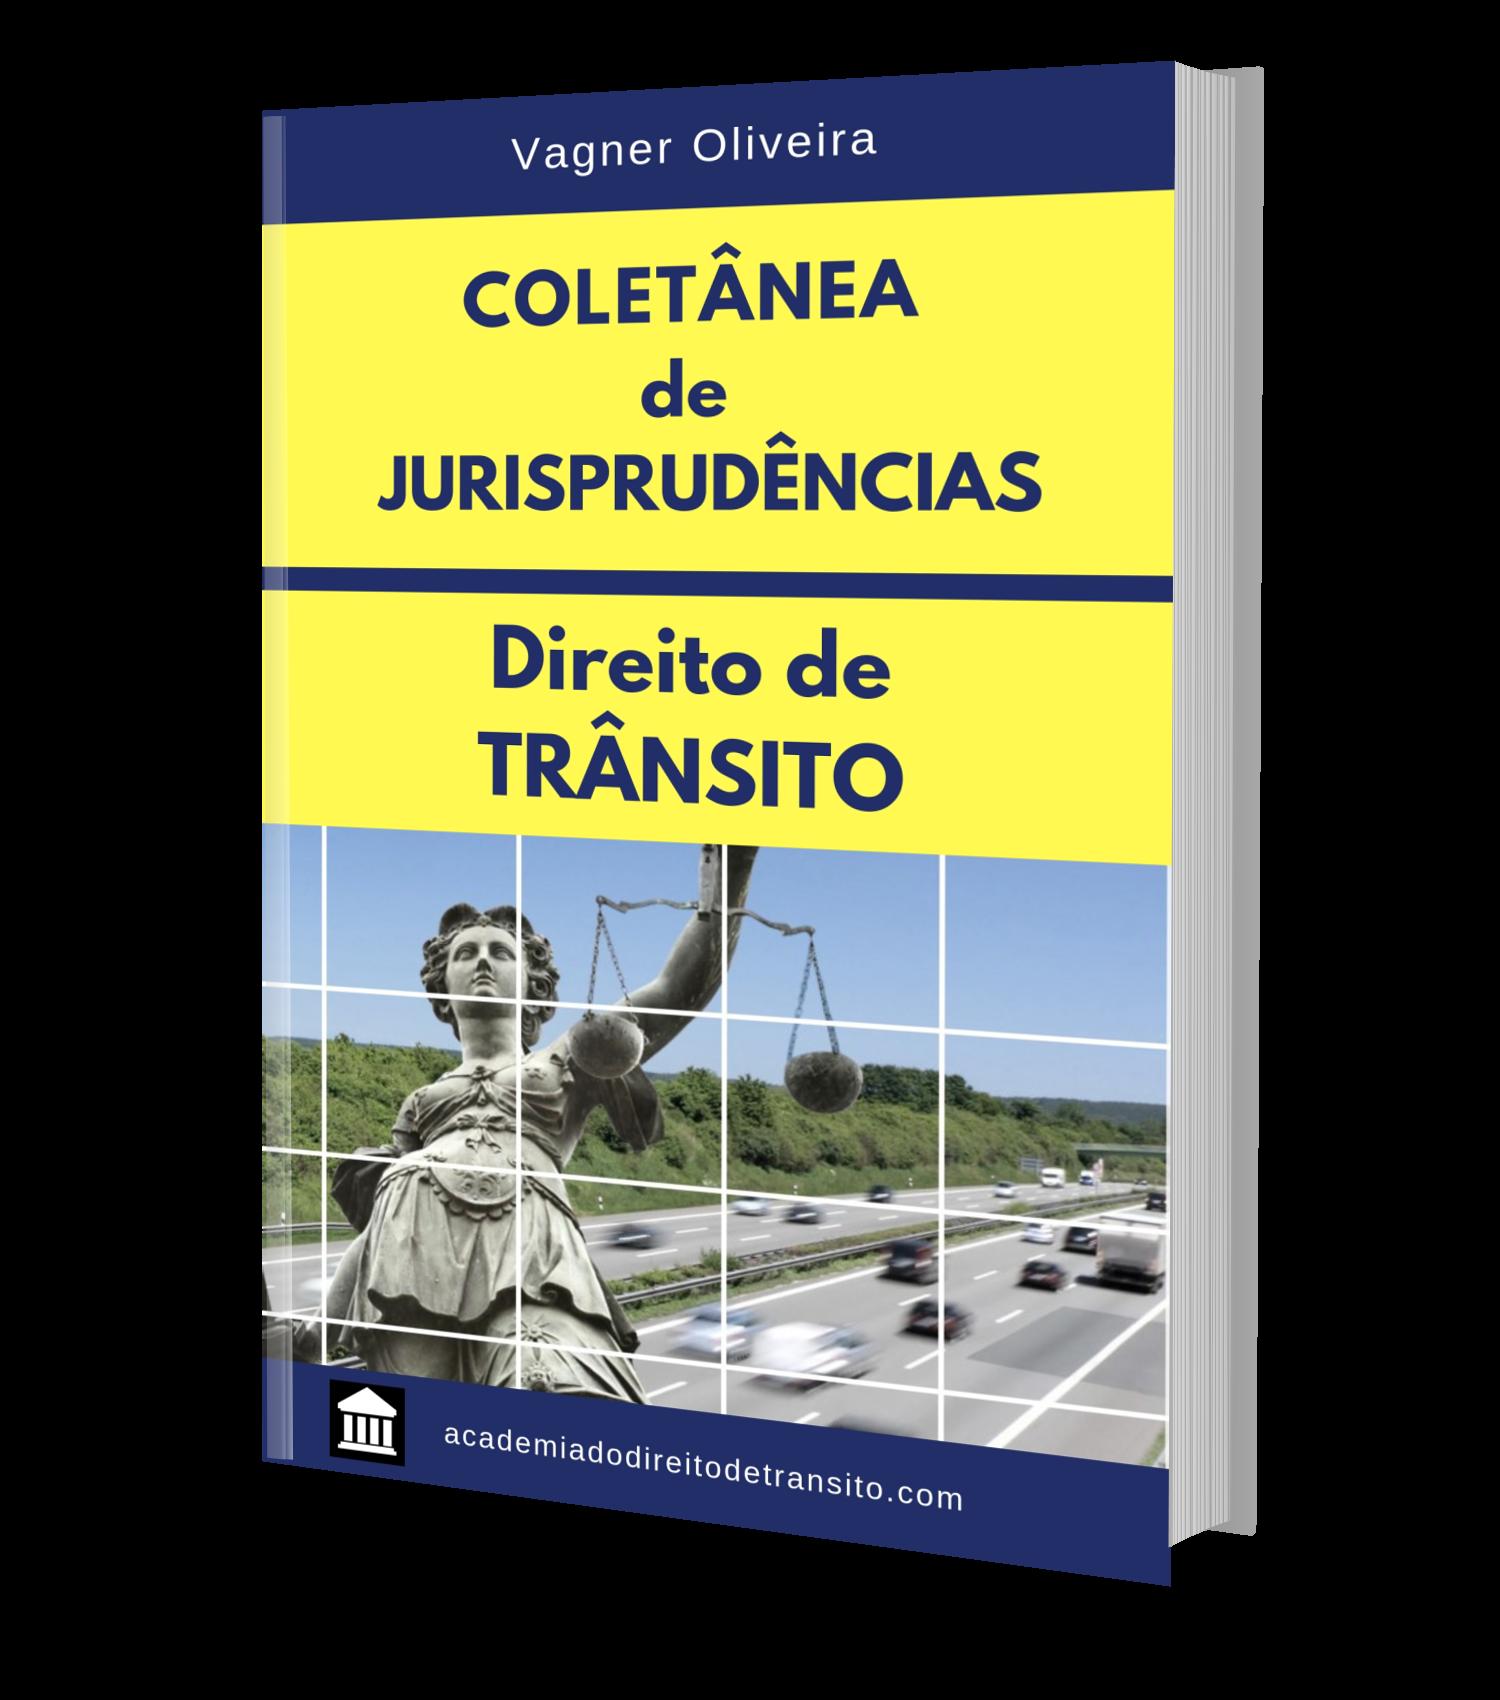 Coletanea